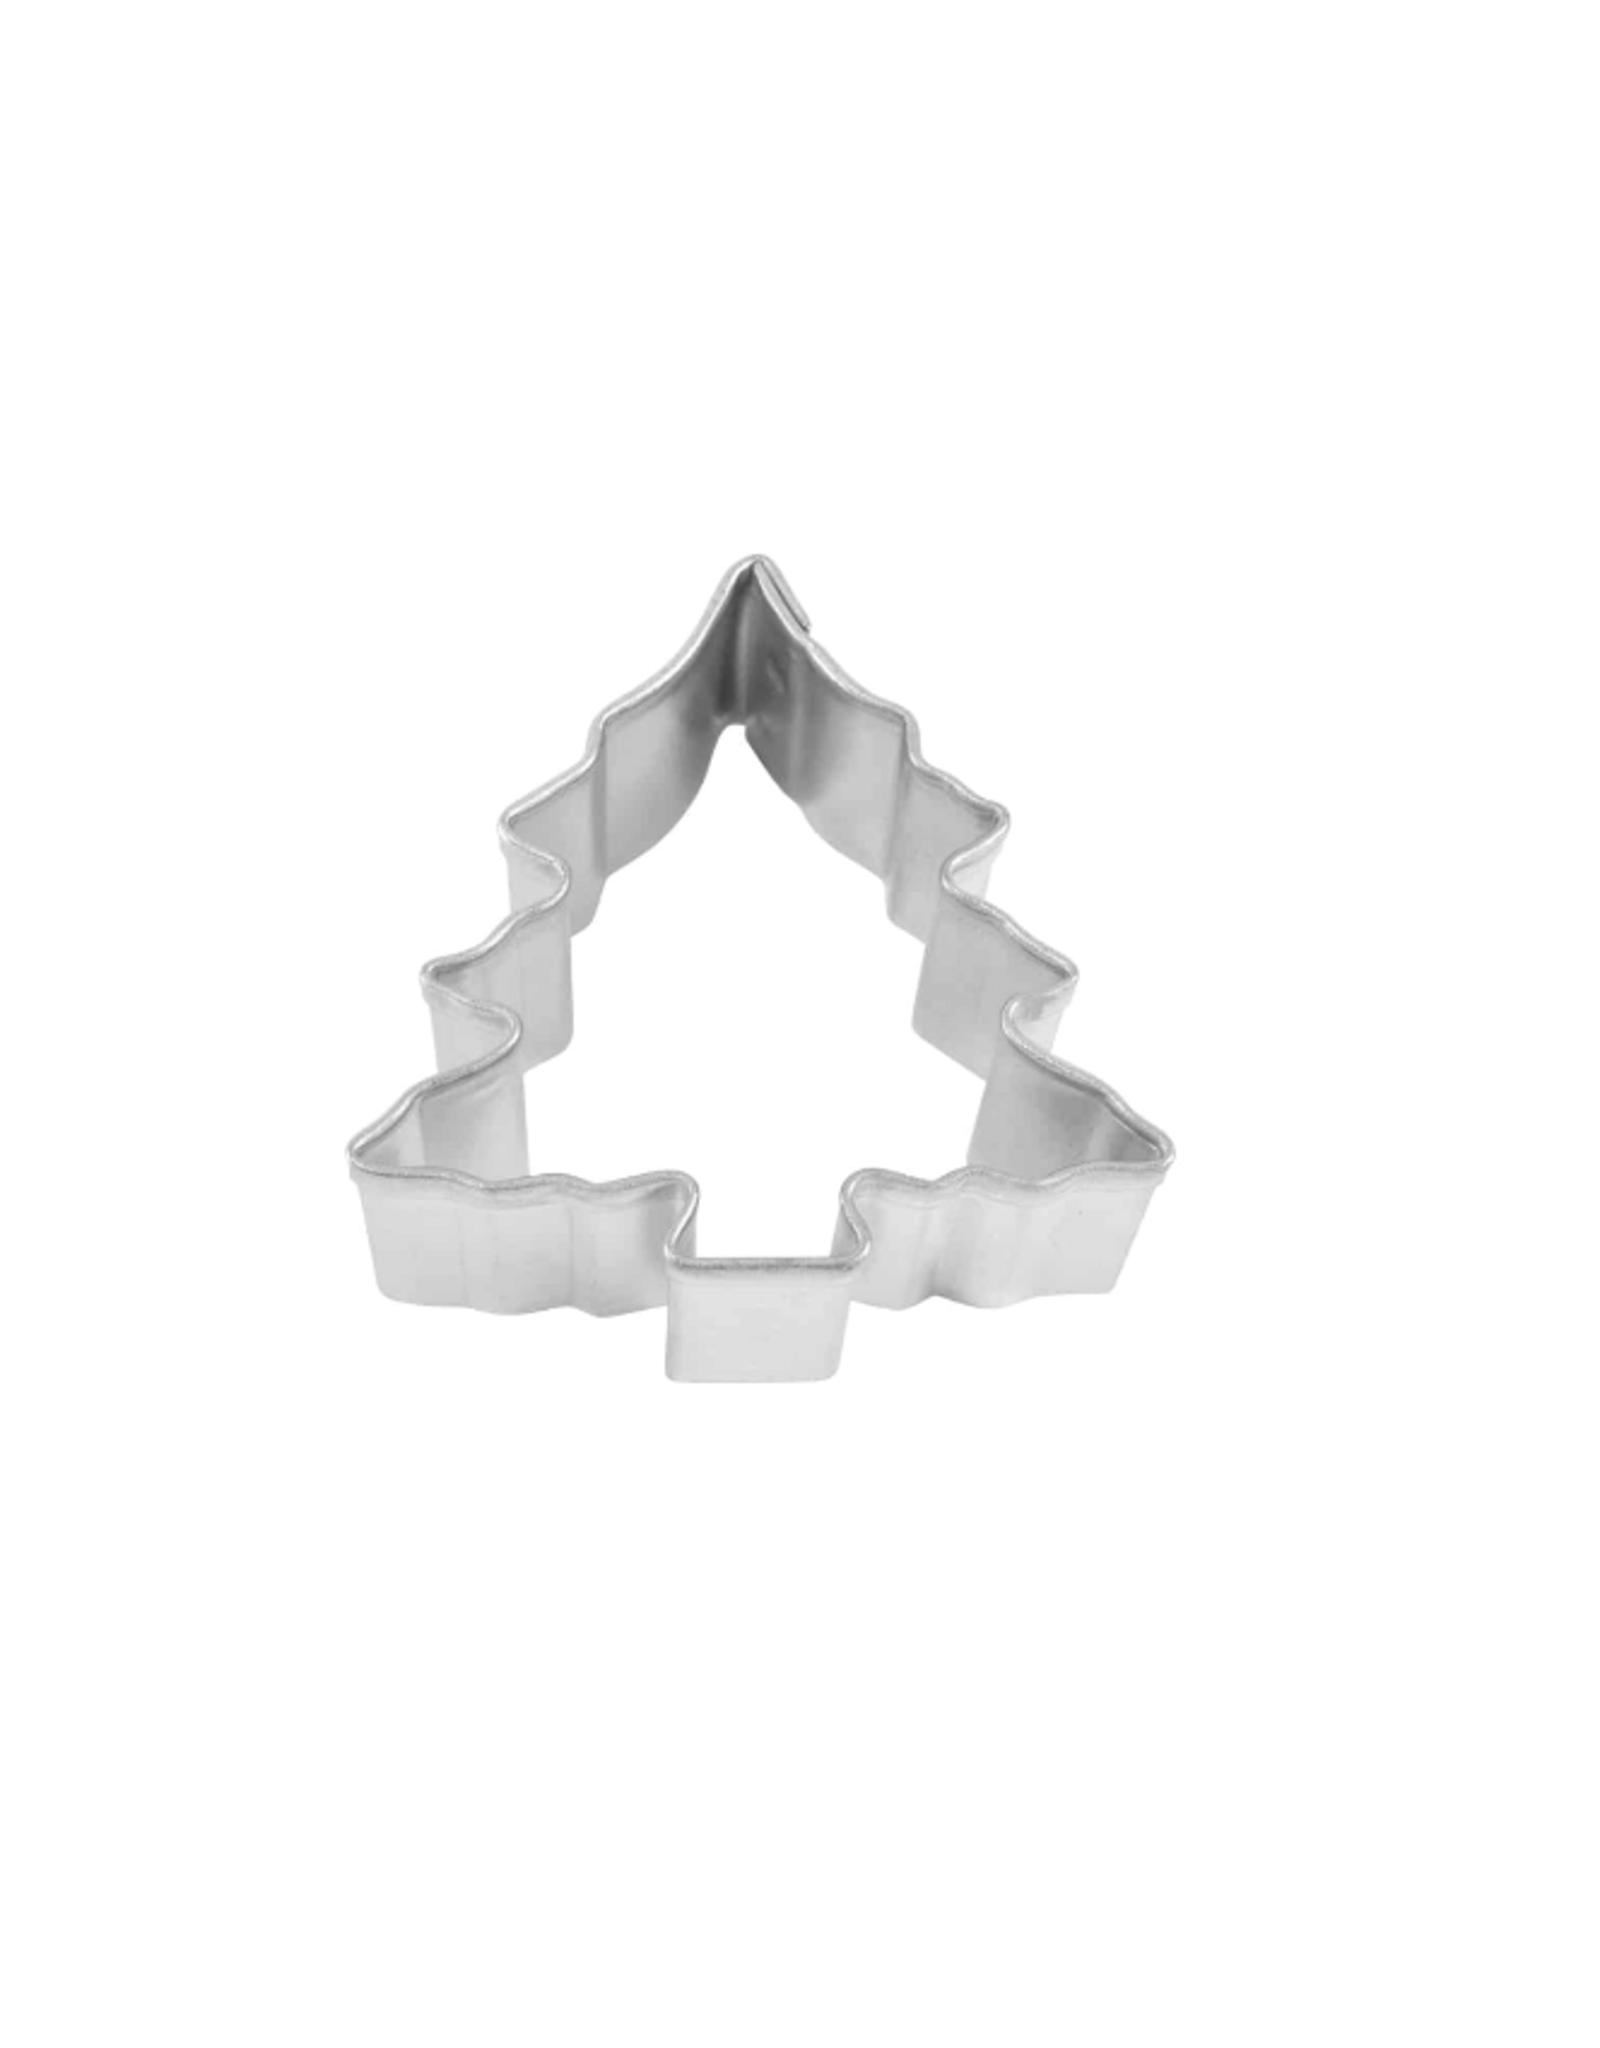 R&M International Cookie Cutter Mini Xmas Tree, single